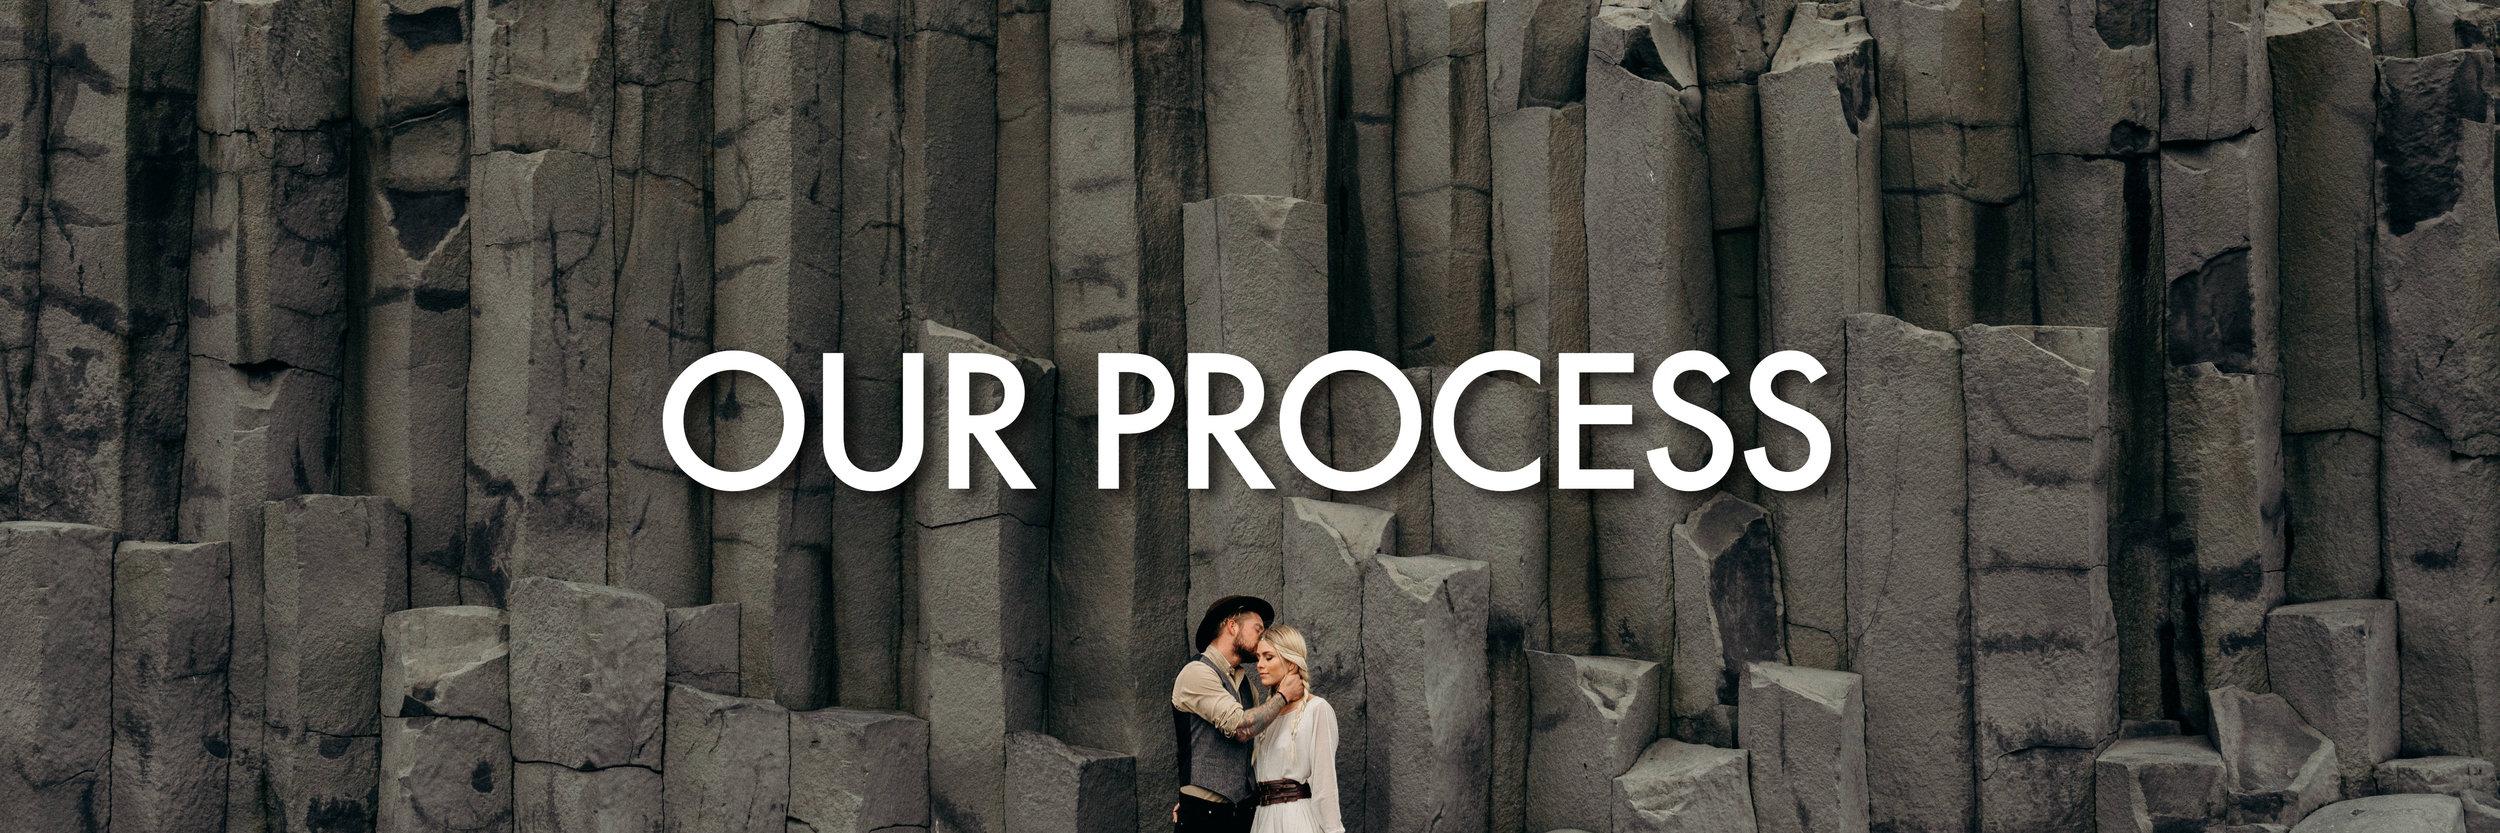 ourprocess.jpg